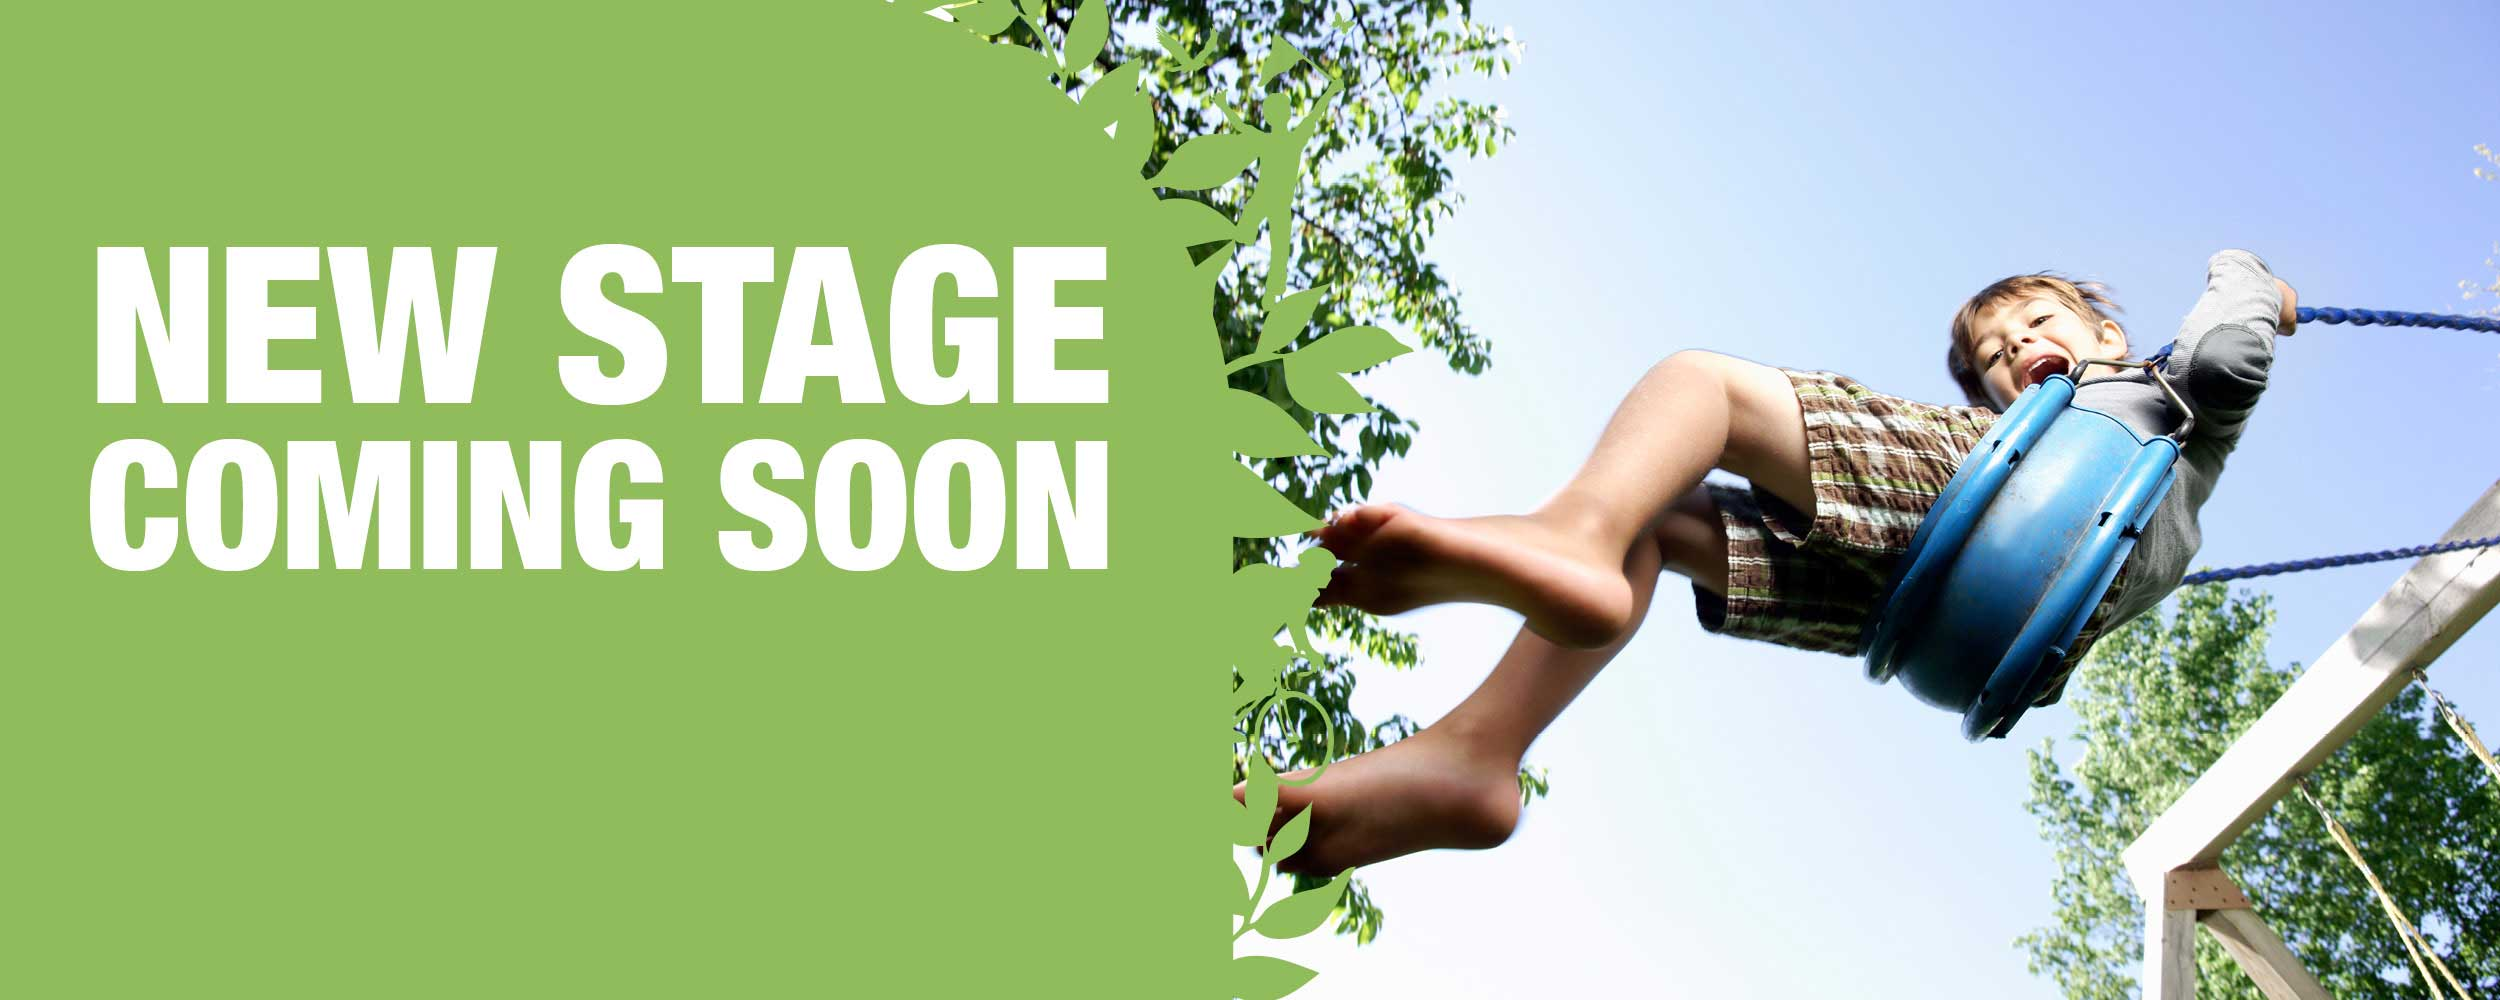 watagan park new stage coming soon land sales